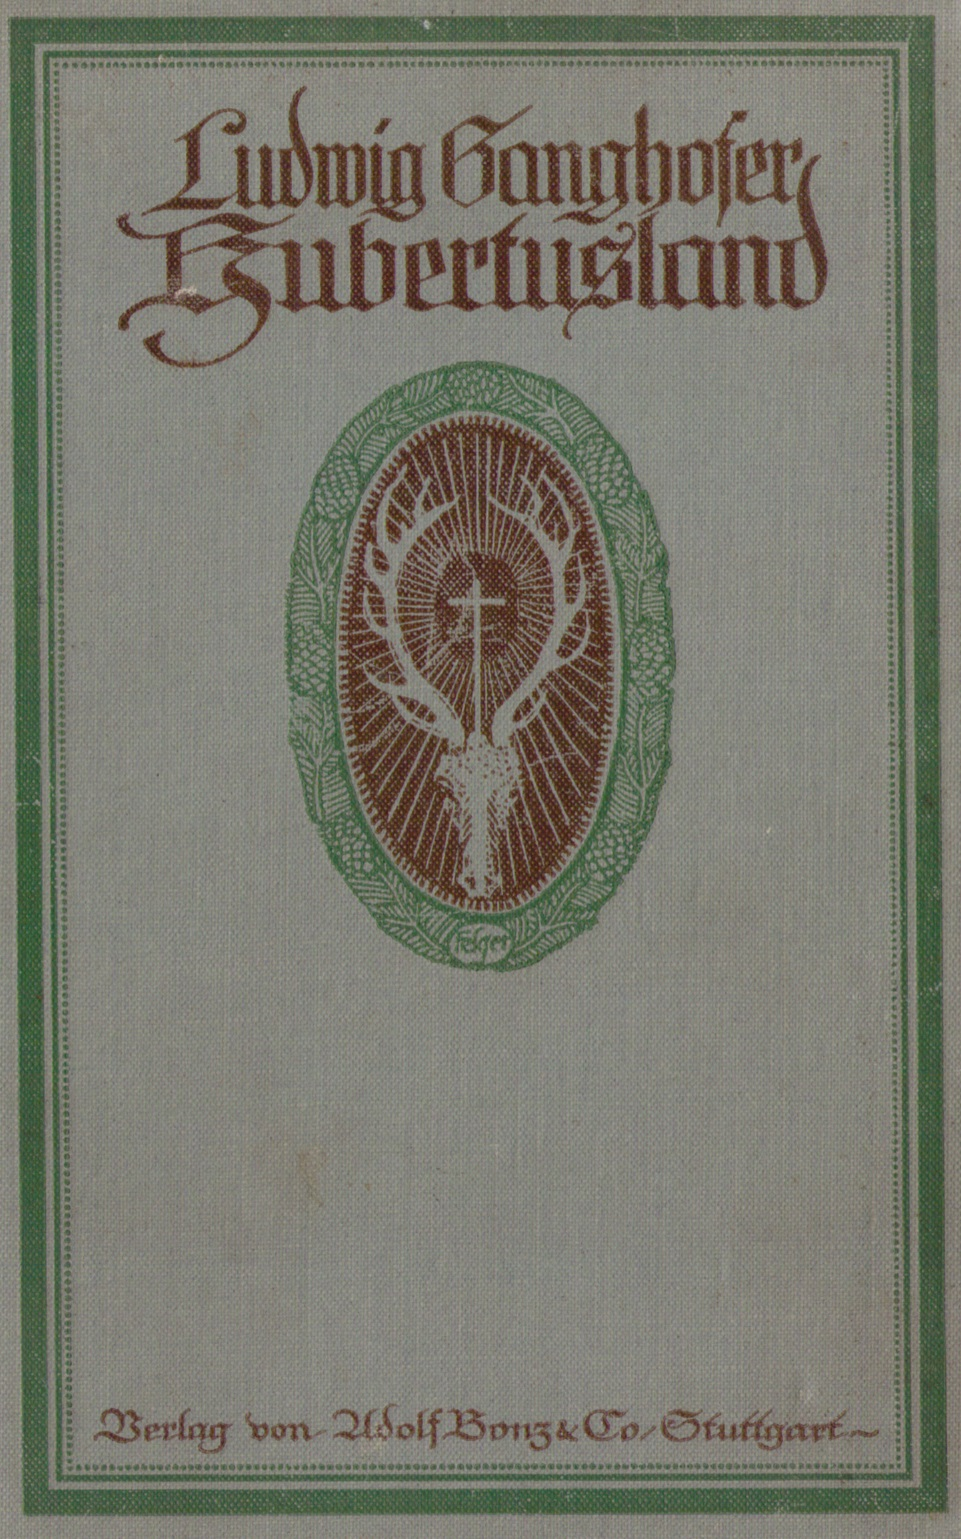 1086_Ludwig Ganghofer - Hubertusland 1912_01p.jpg